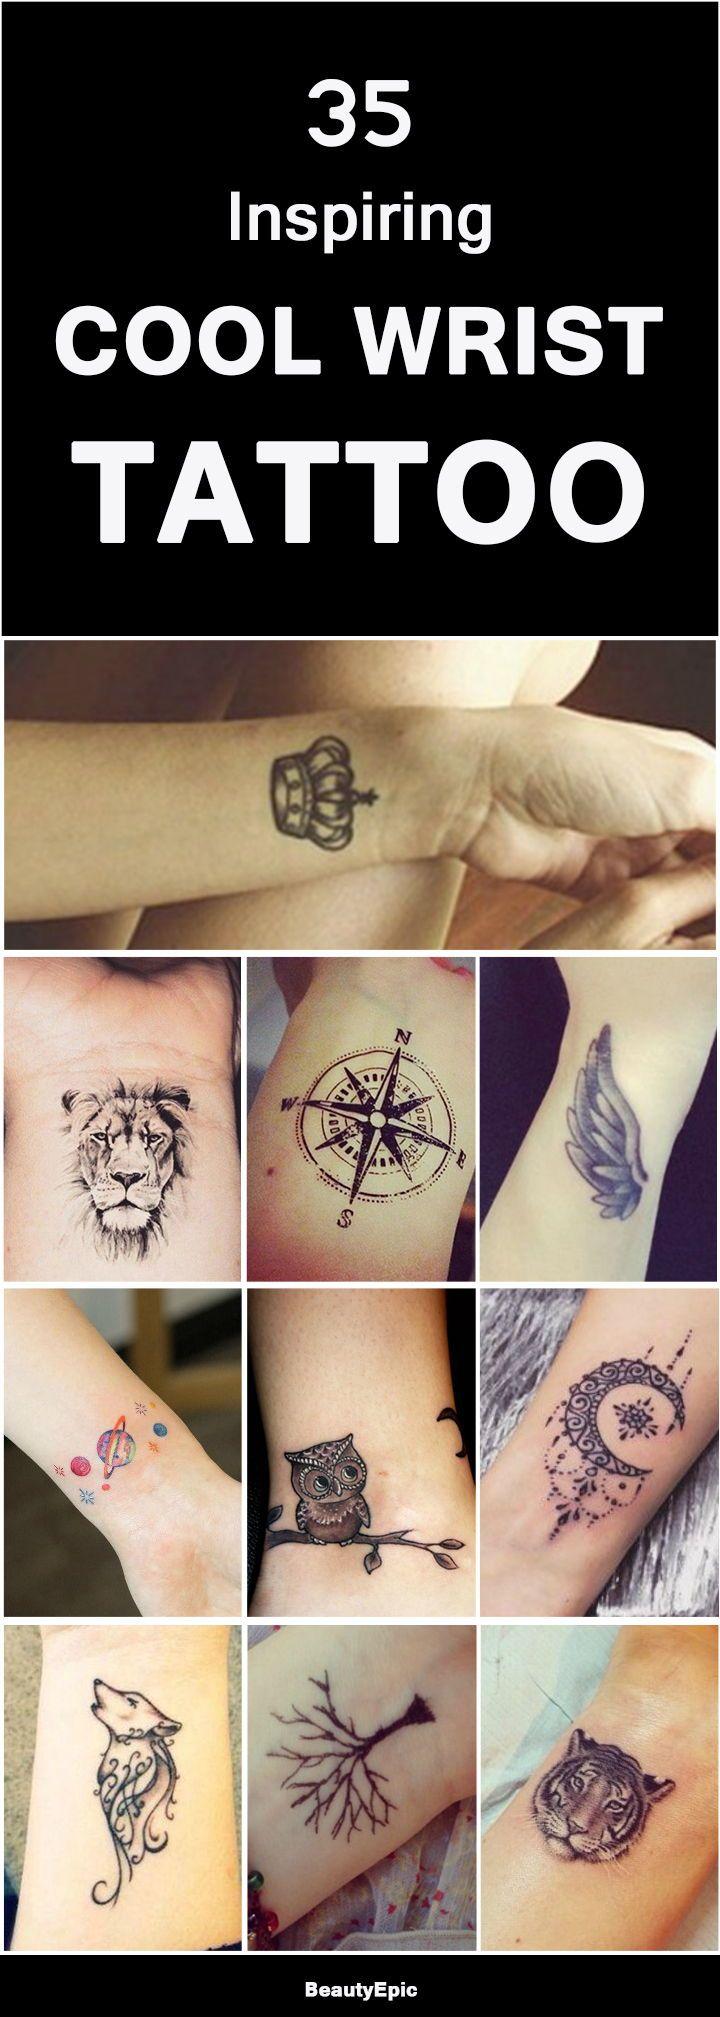 35 Inspiring Cool Wrist Tattoos For Men Women To Get Now Cool Wrist Tattoos Wrist Tattoos For Guys Tattoos For Guys